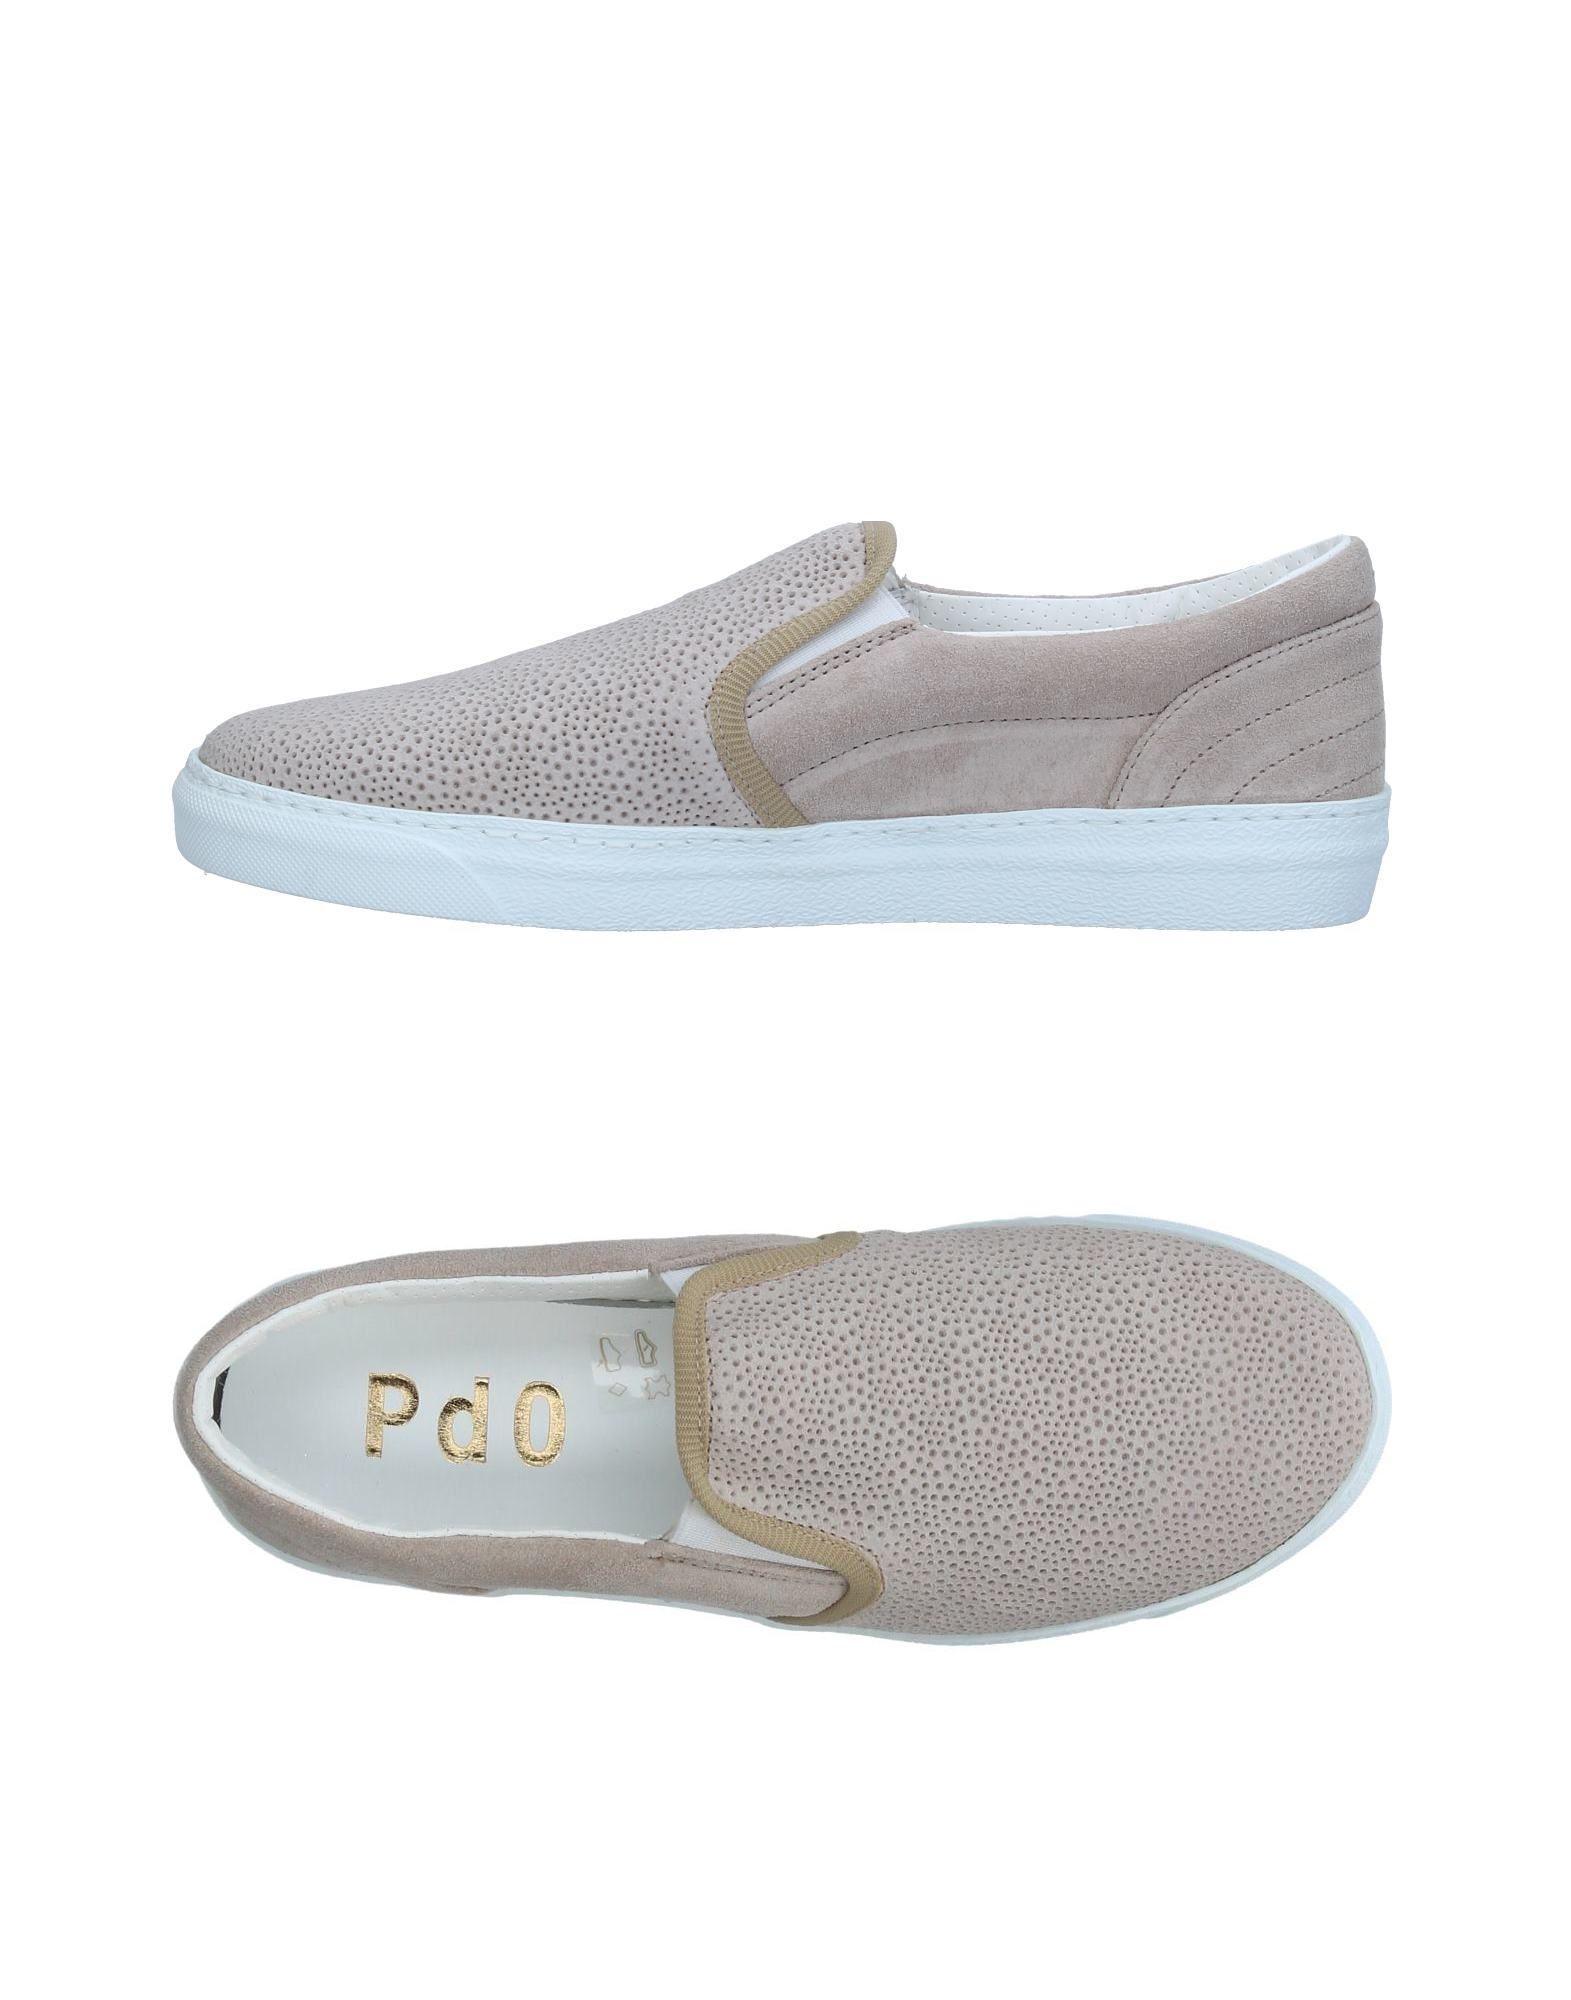 Sneakers Pantofola D'oro Donna - 11339381XV